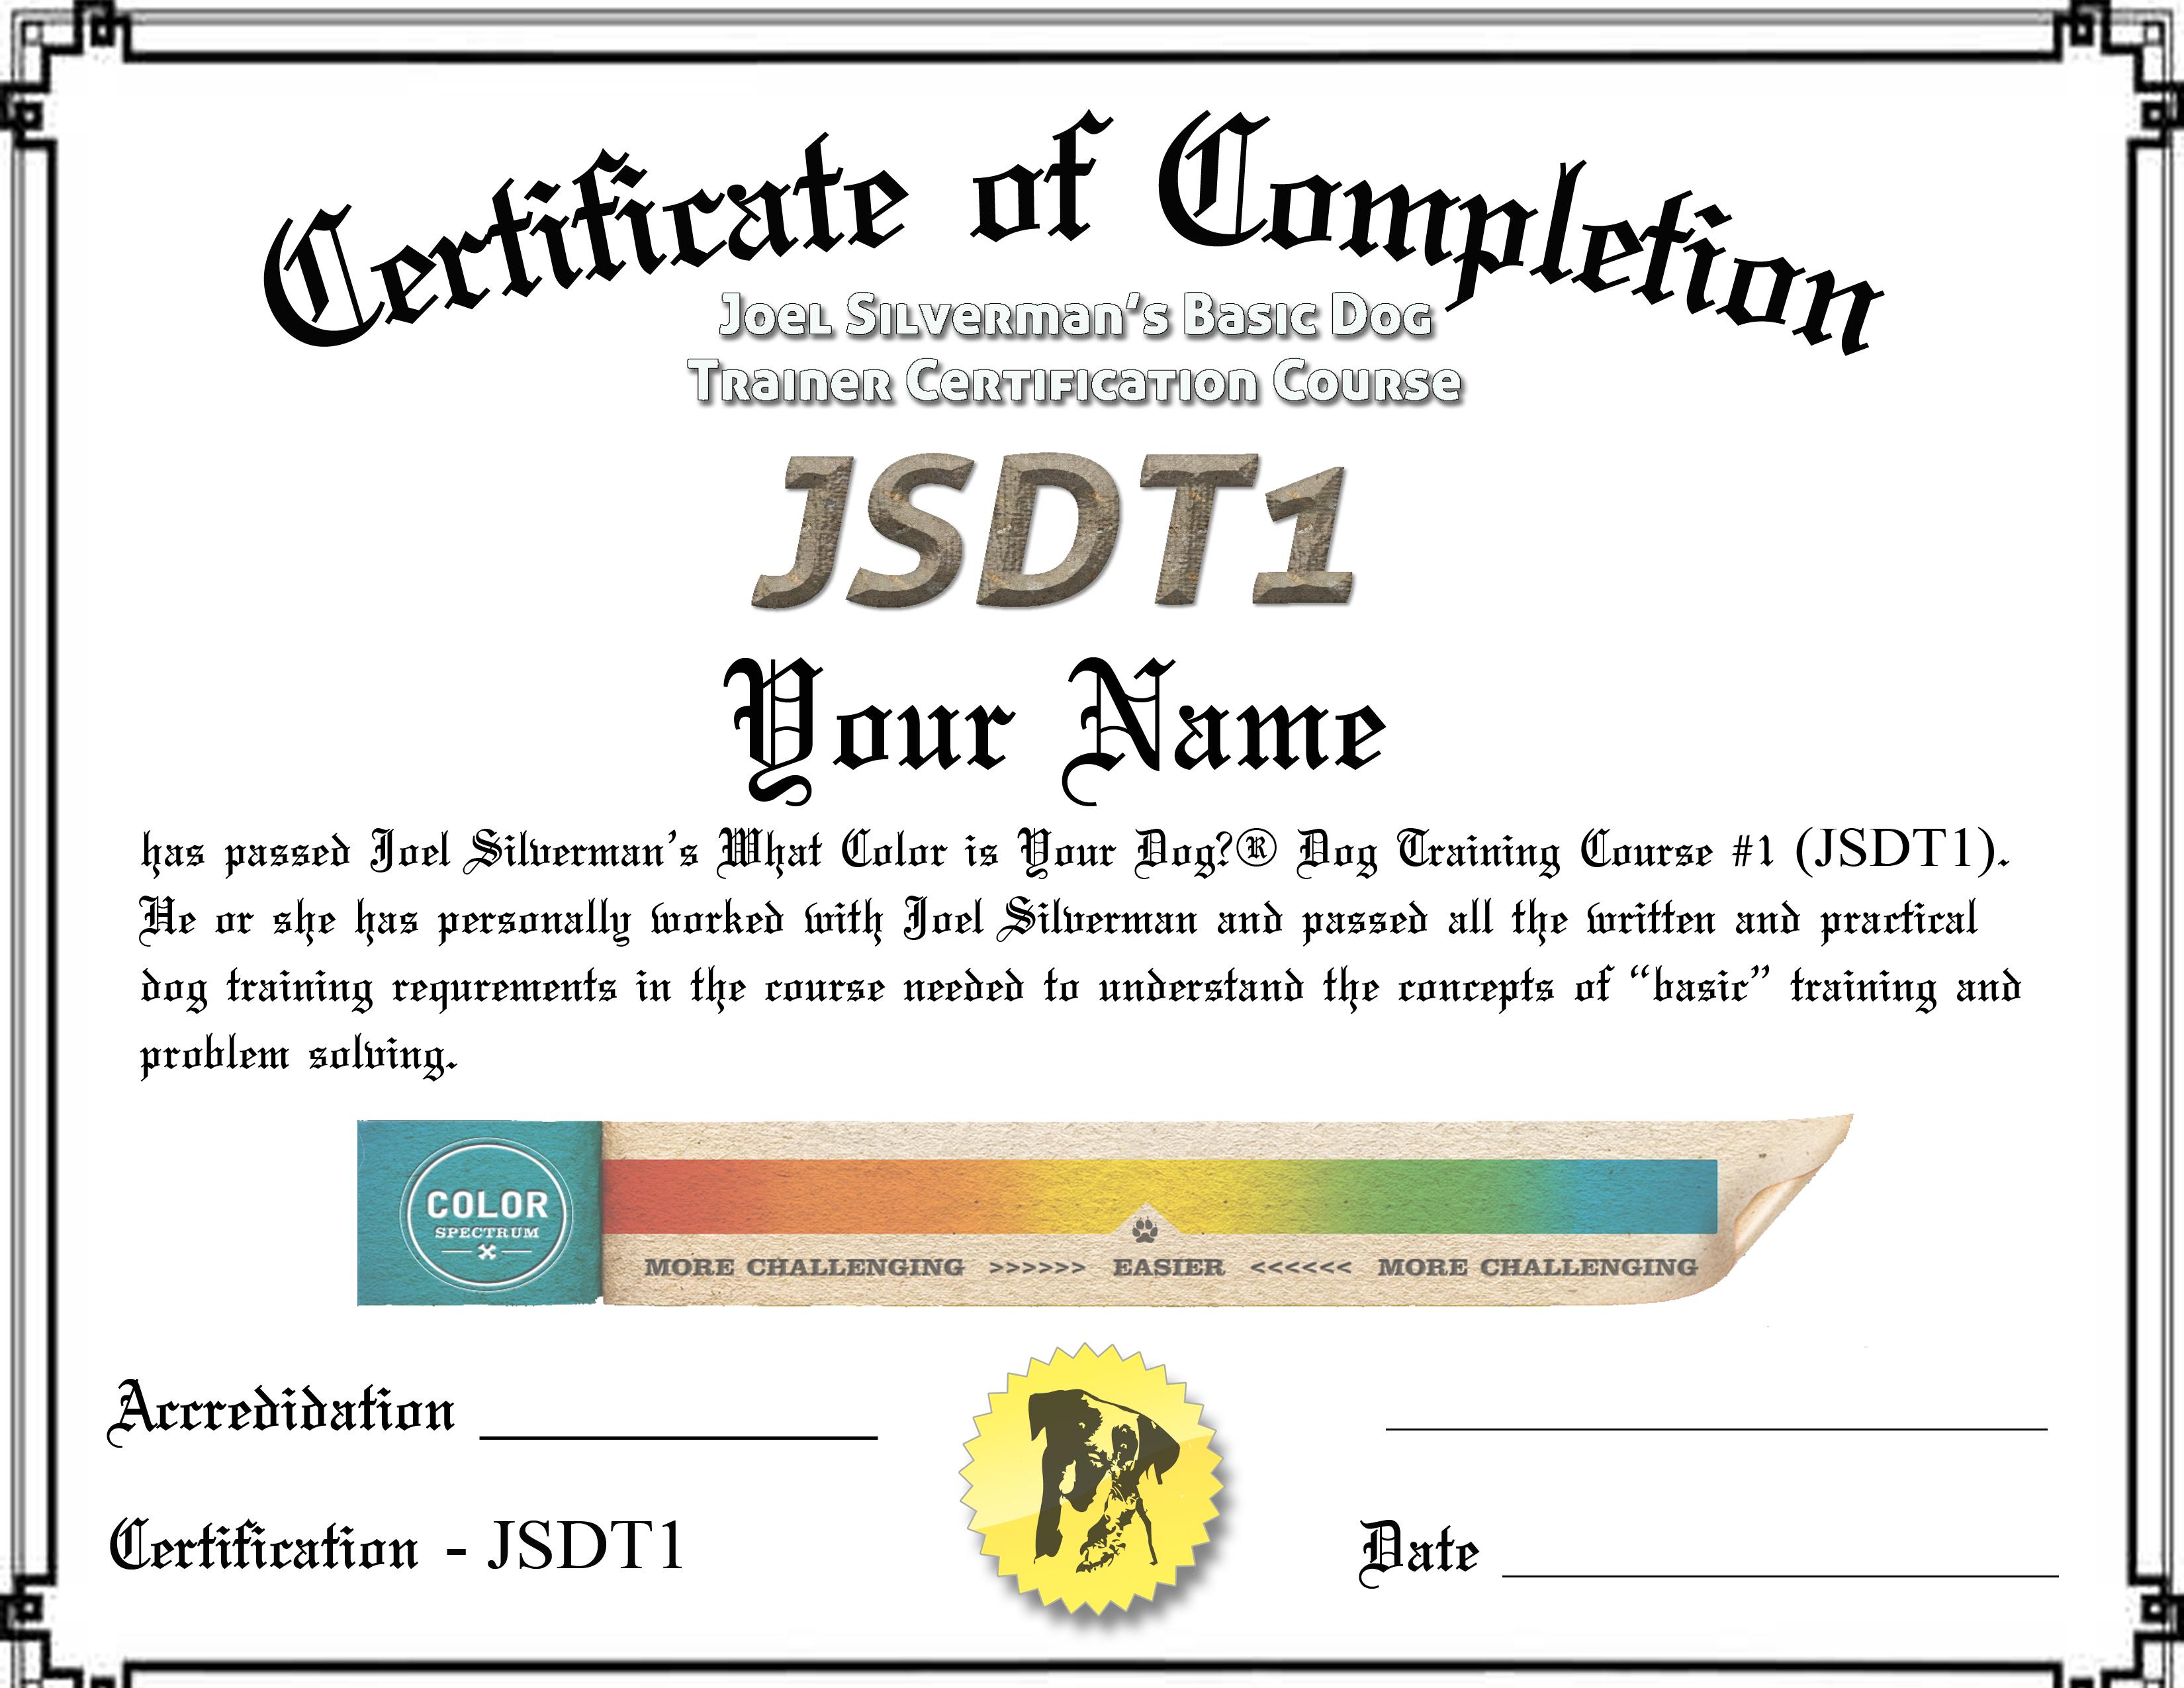 Joel Silverman's dog trainer certification course certification